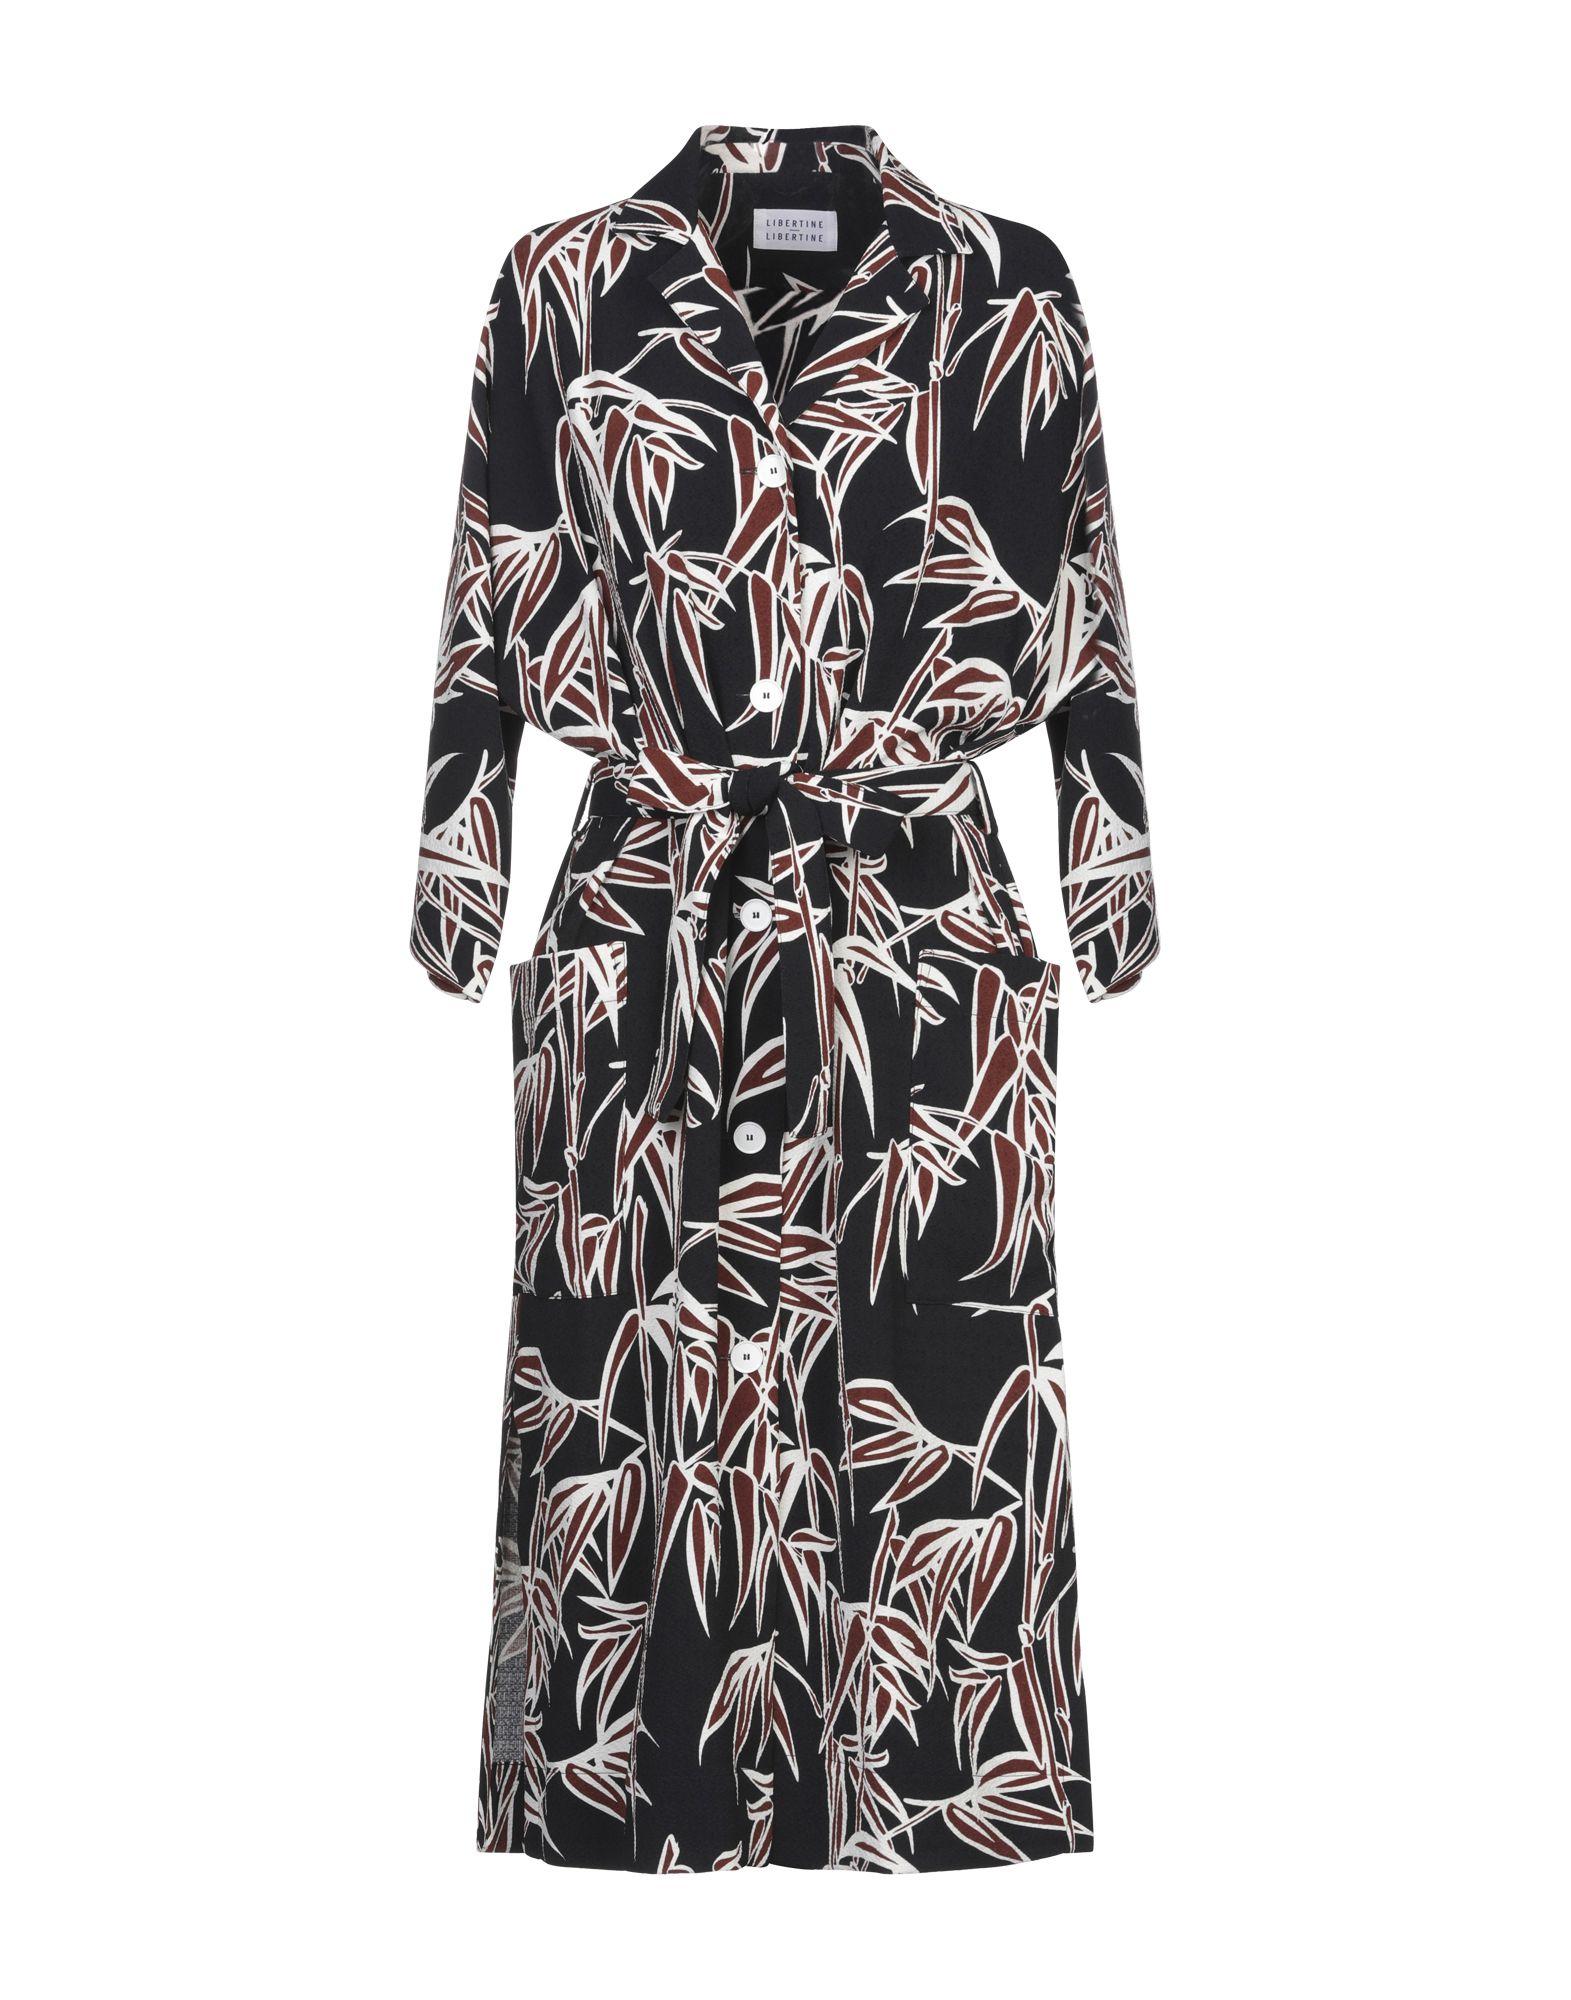 Фото - LIBERTINE-LIBERTINE Платье длиной 3/4 libertine libertine платье до колена